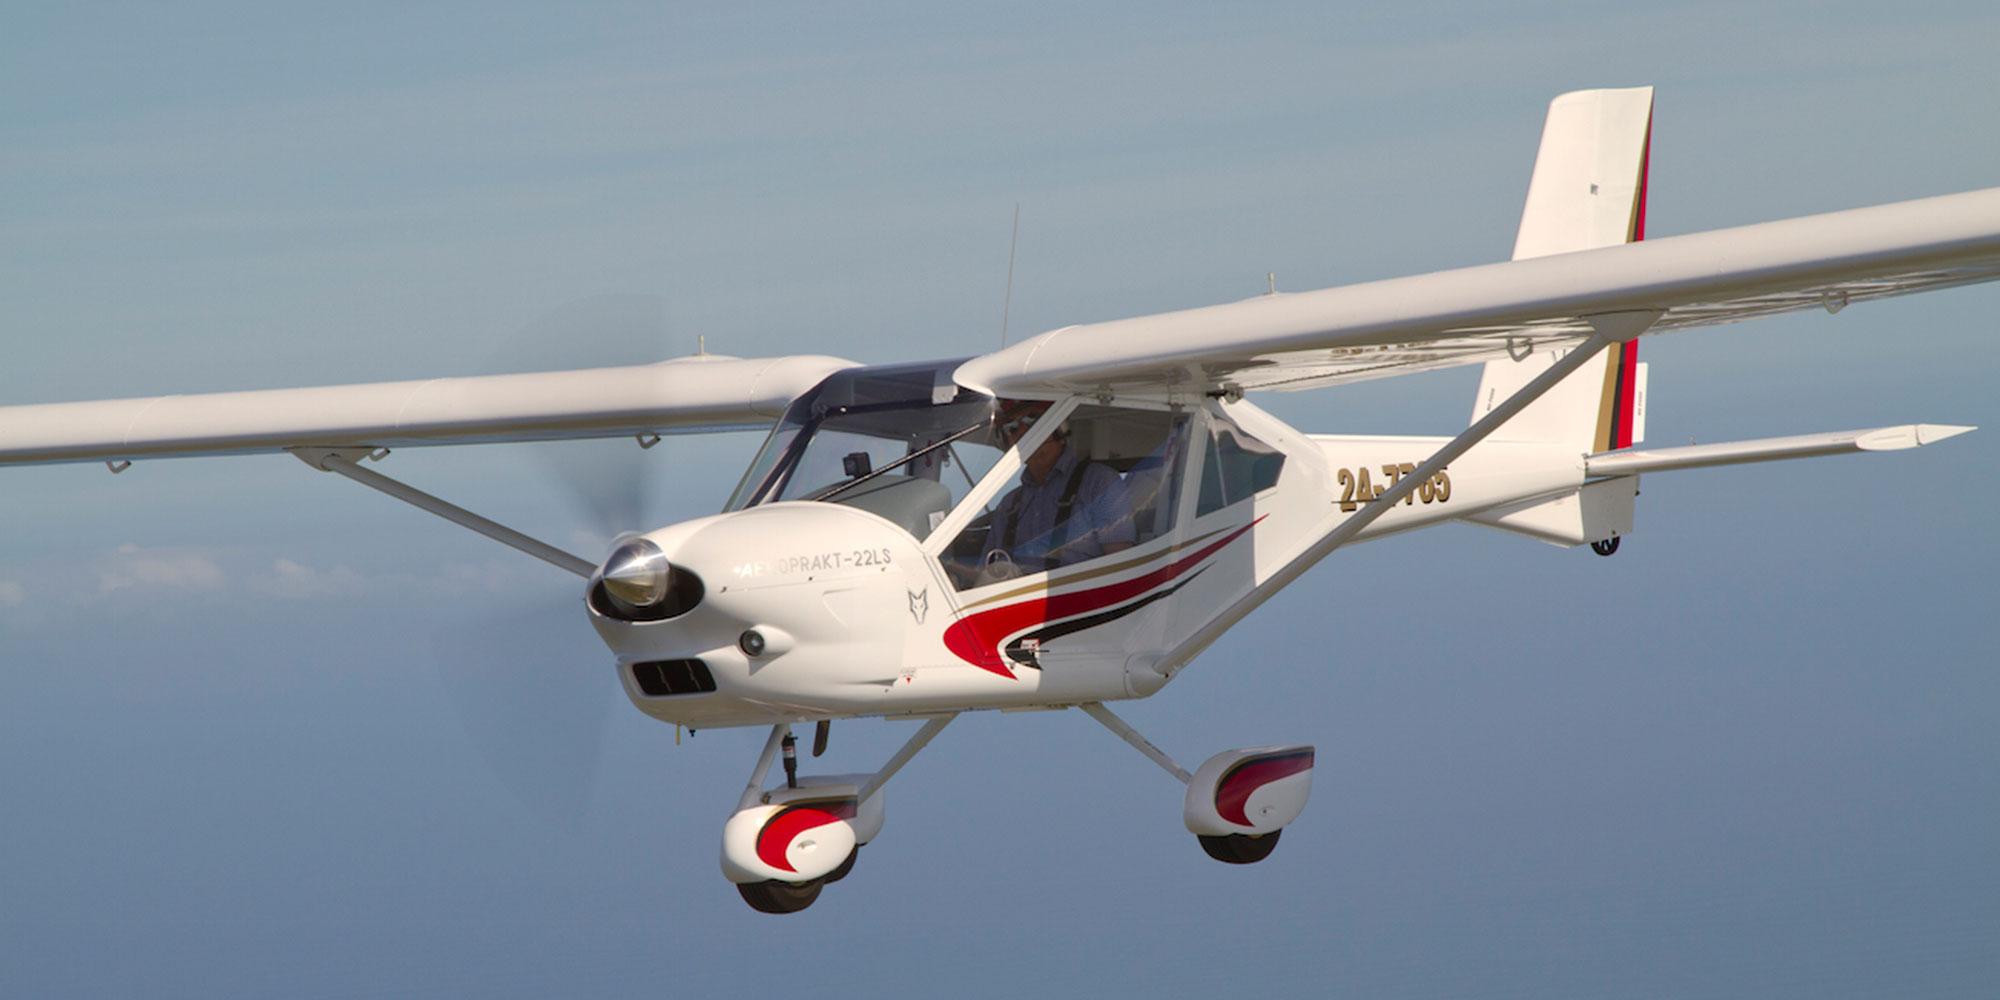 aeroprakt vente avion neuf et d 39 occasion maintenance. Black Bedroom Furniture Sets. Home Design Ideas